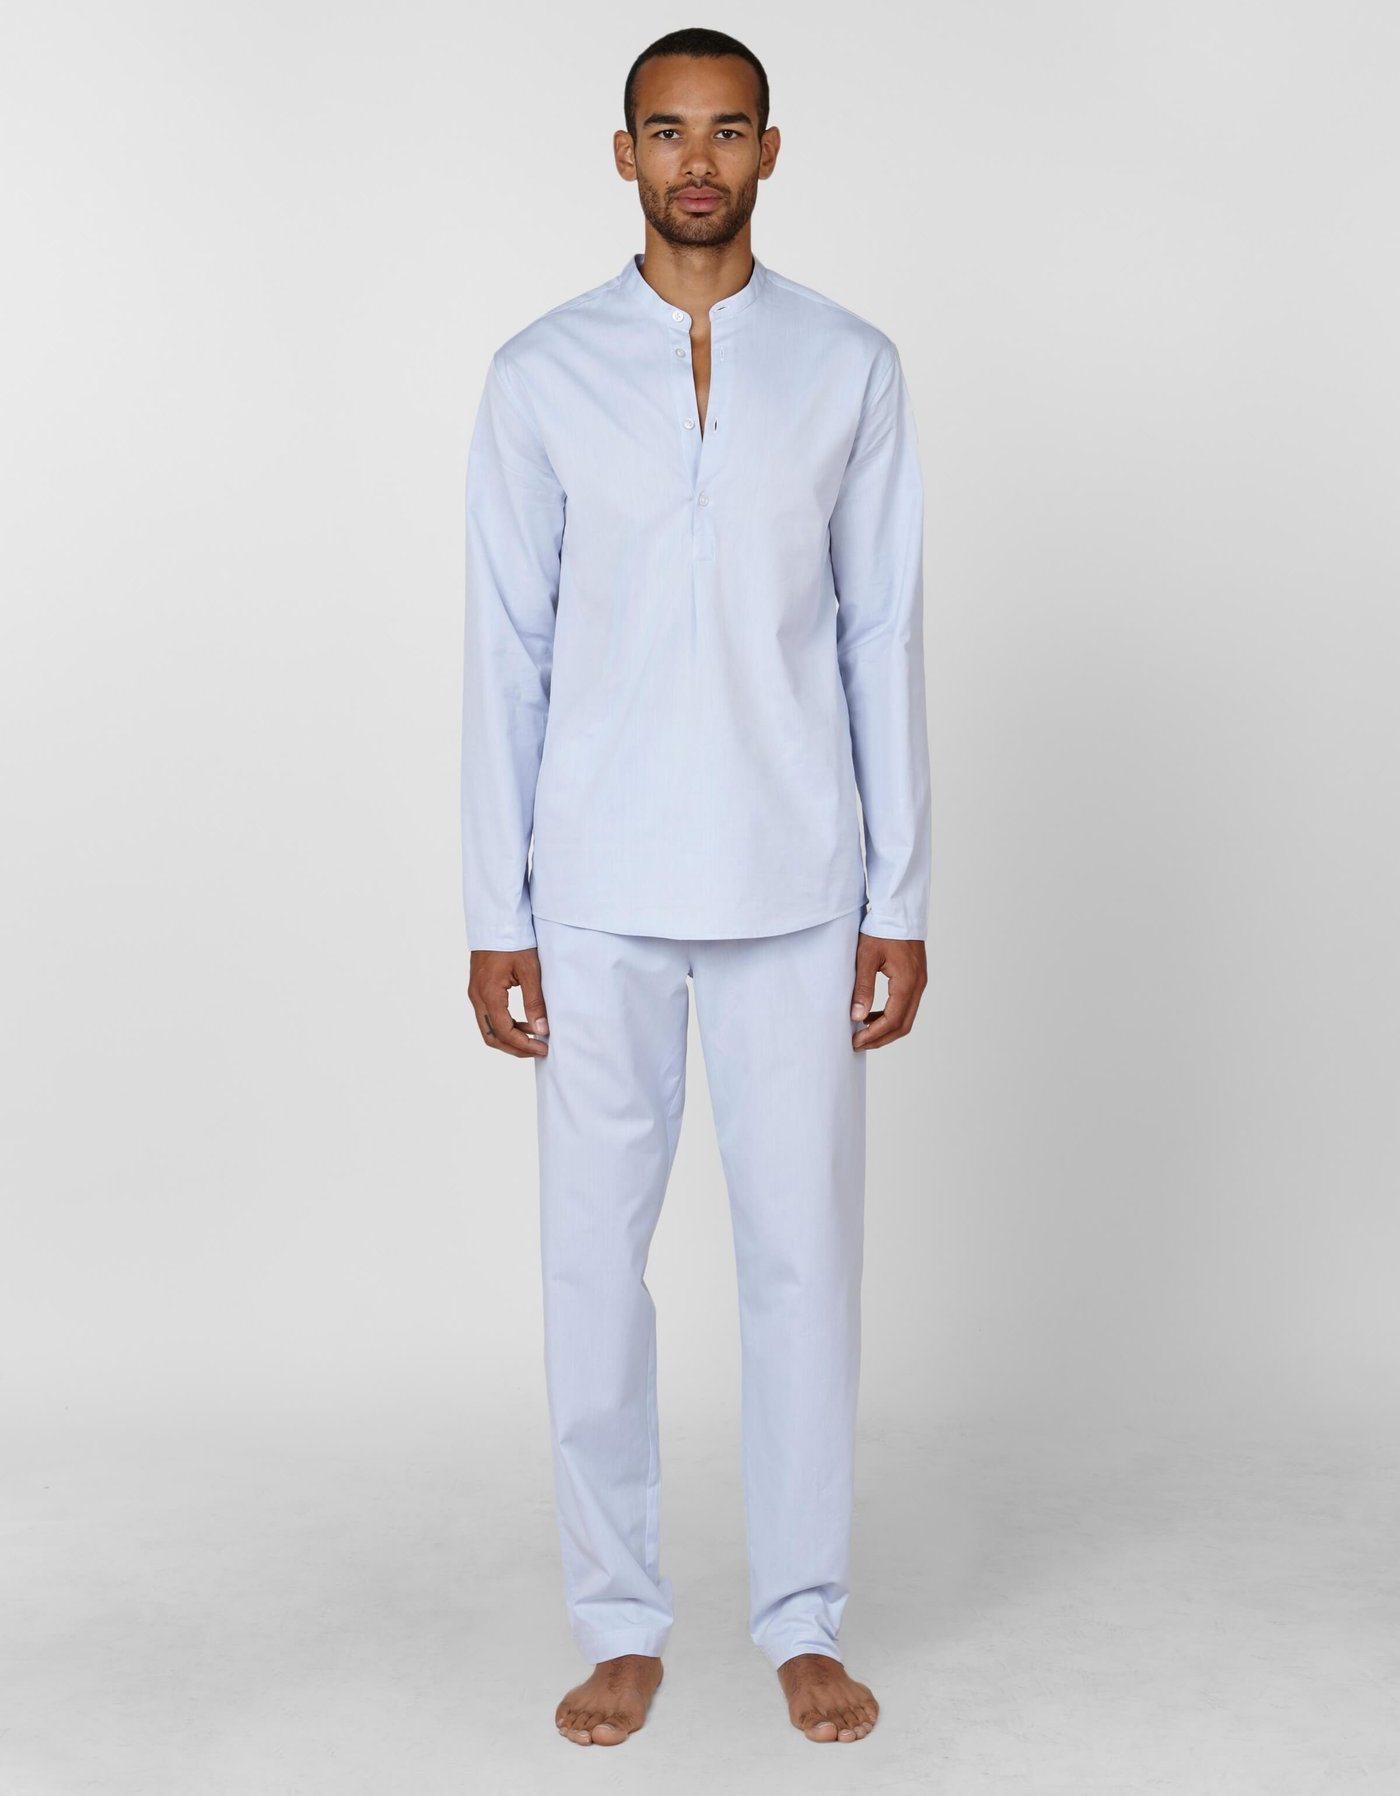 pyjamas-light-blue-1_1400x